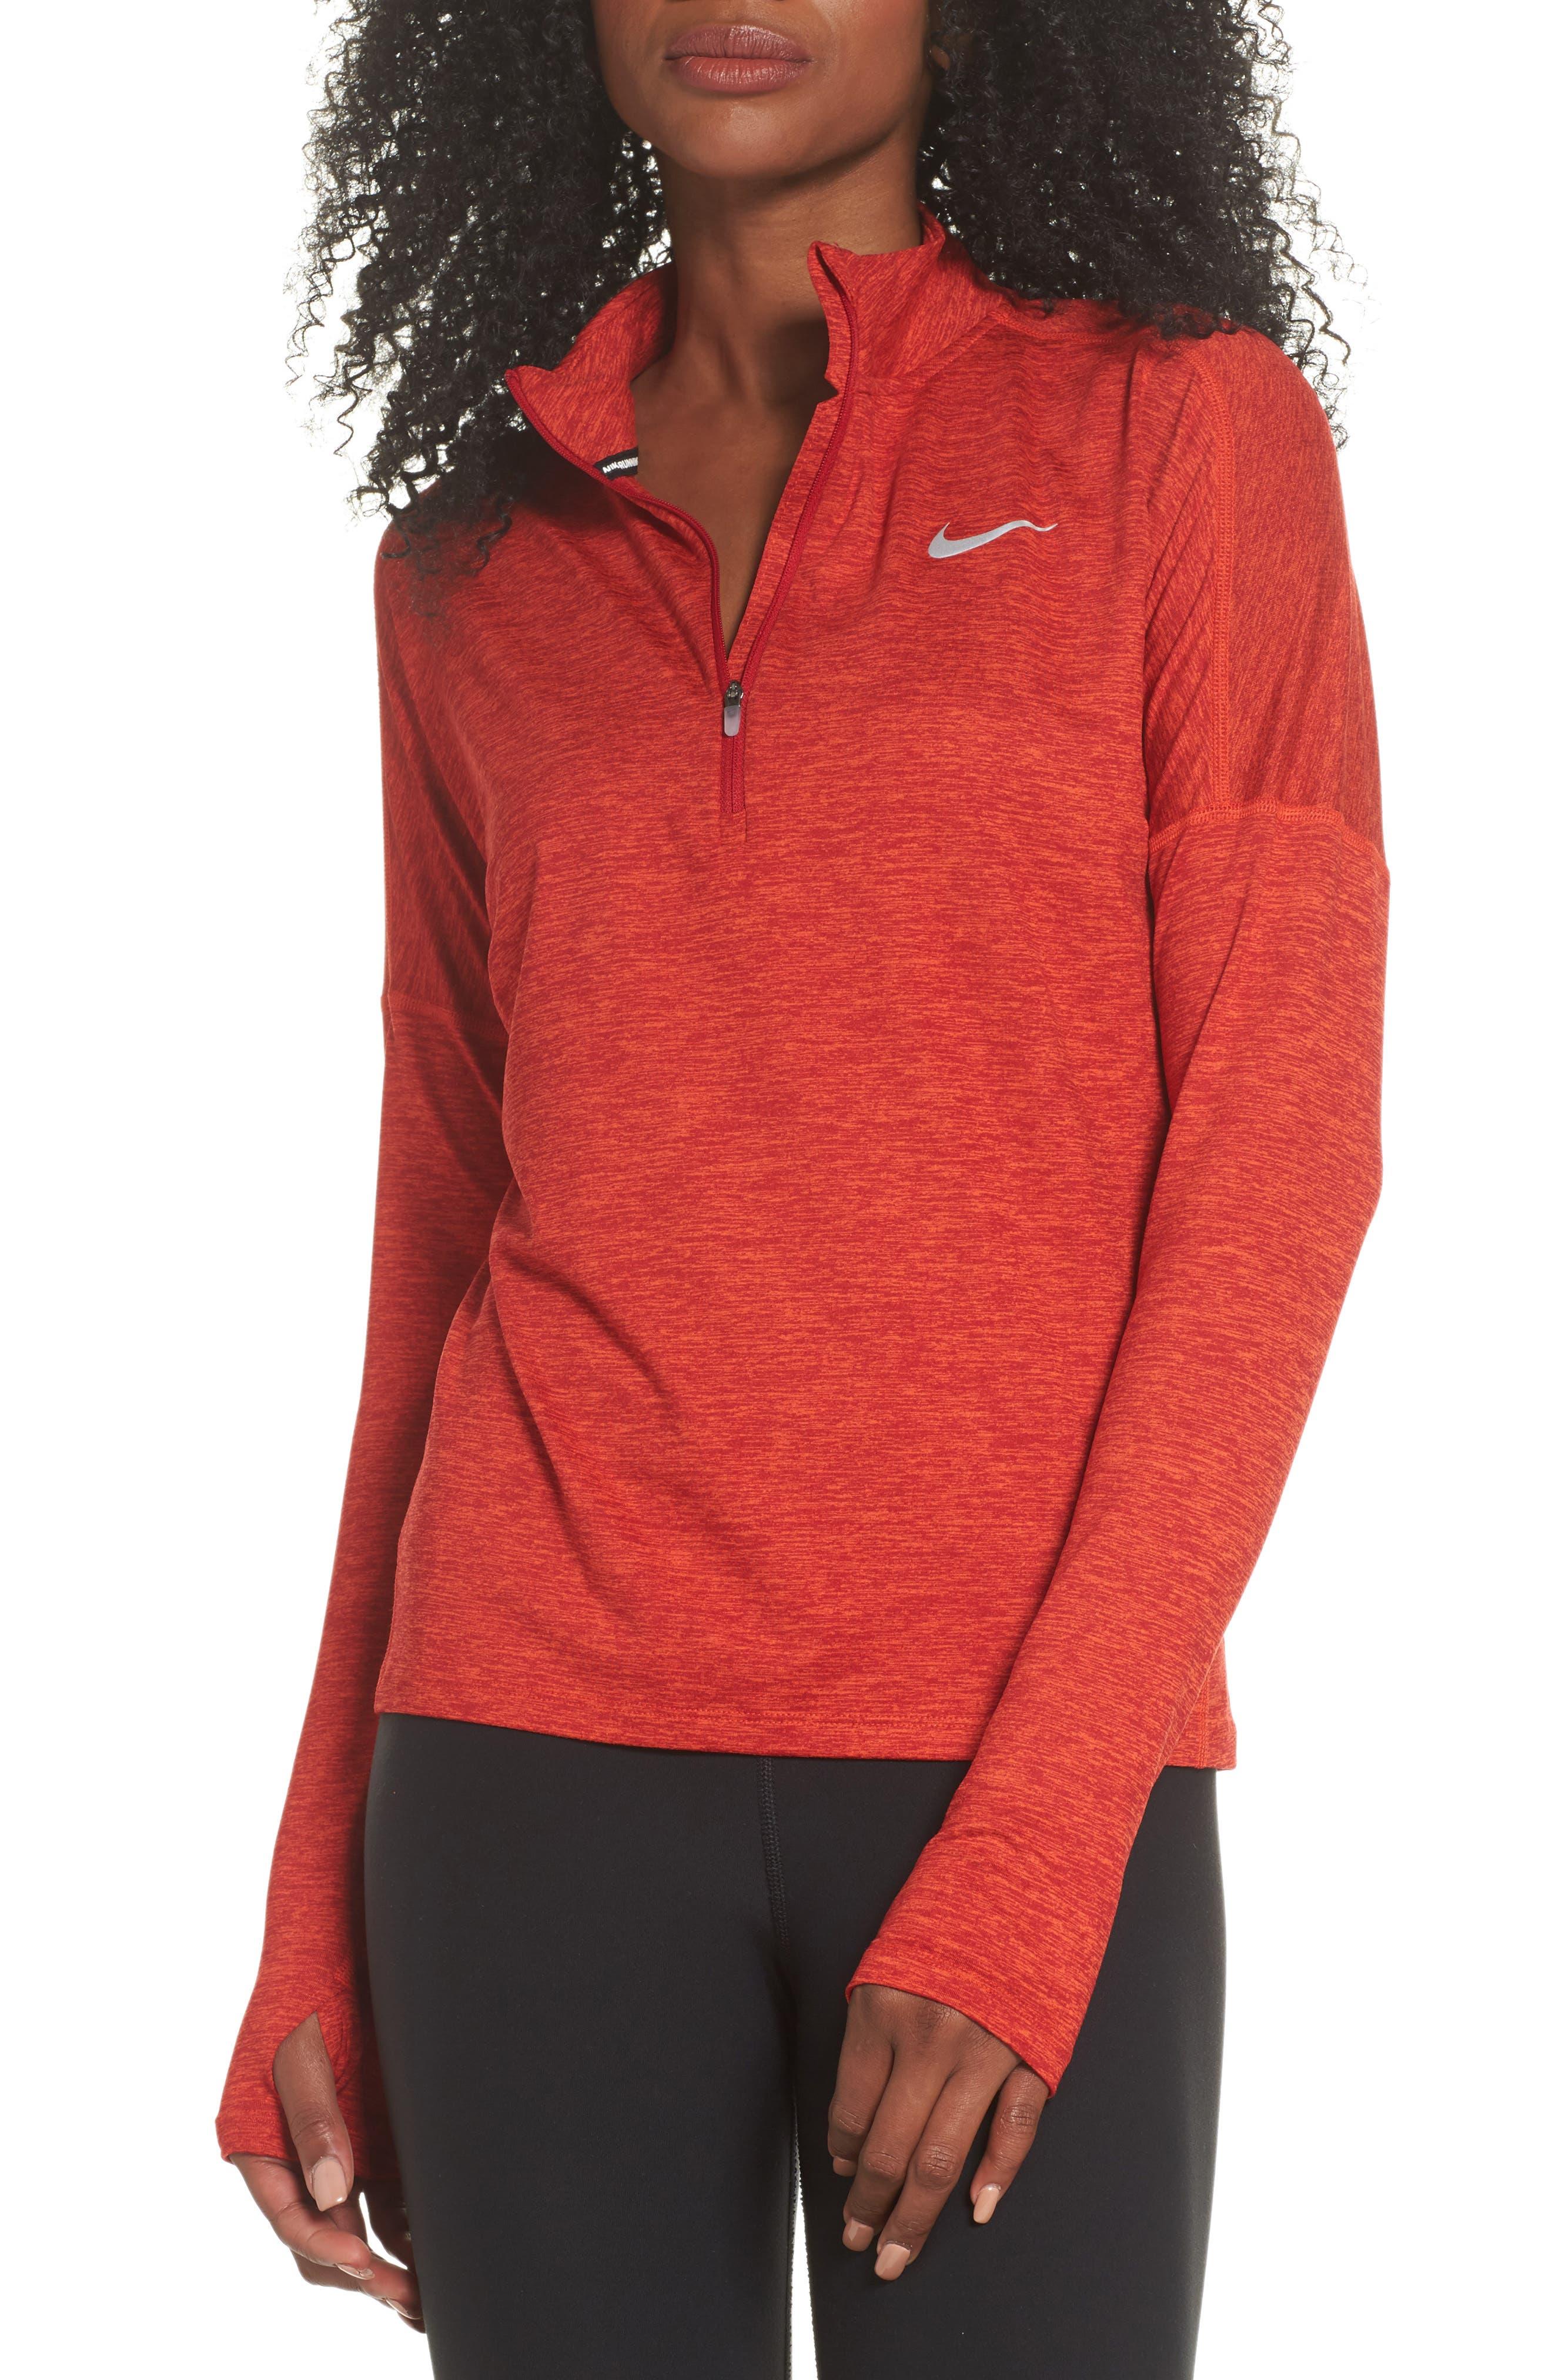 Dry Element Half Zip Top,                         Main,                         color, Gym Red/ Habanero Red/ Heather